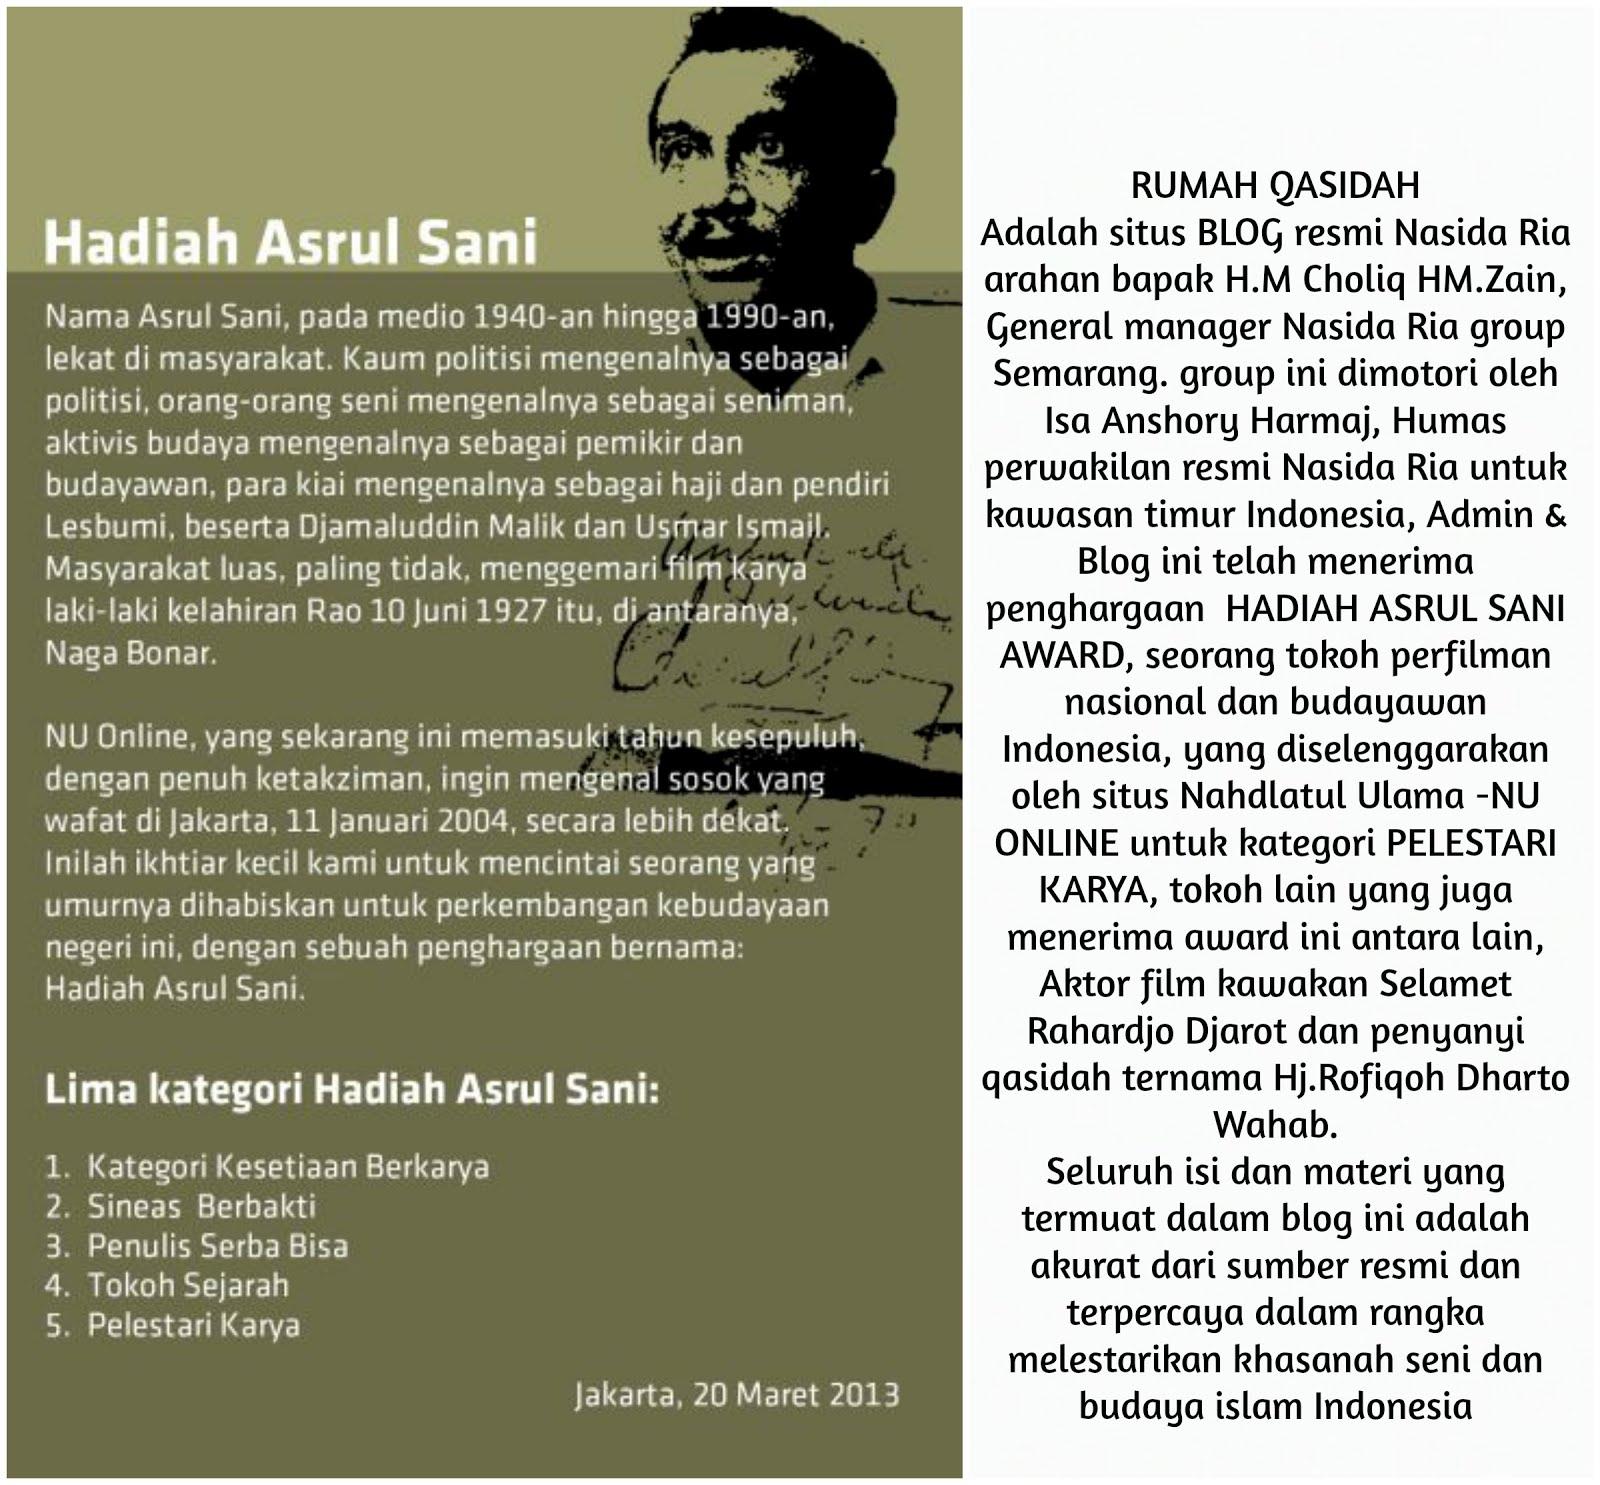 PENGHARGAAN HADIAH ASRUL SANI